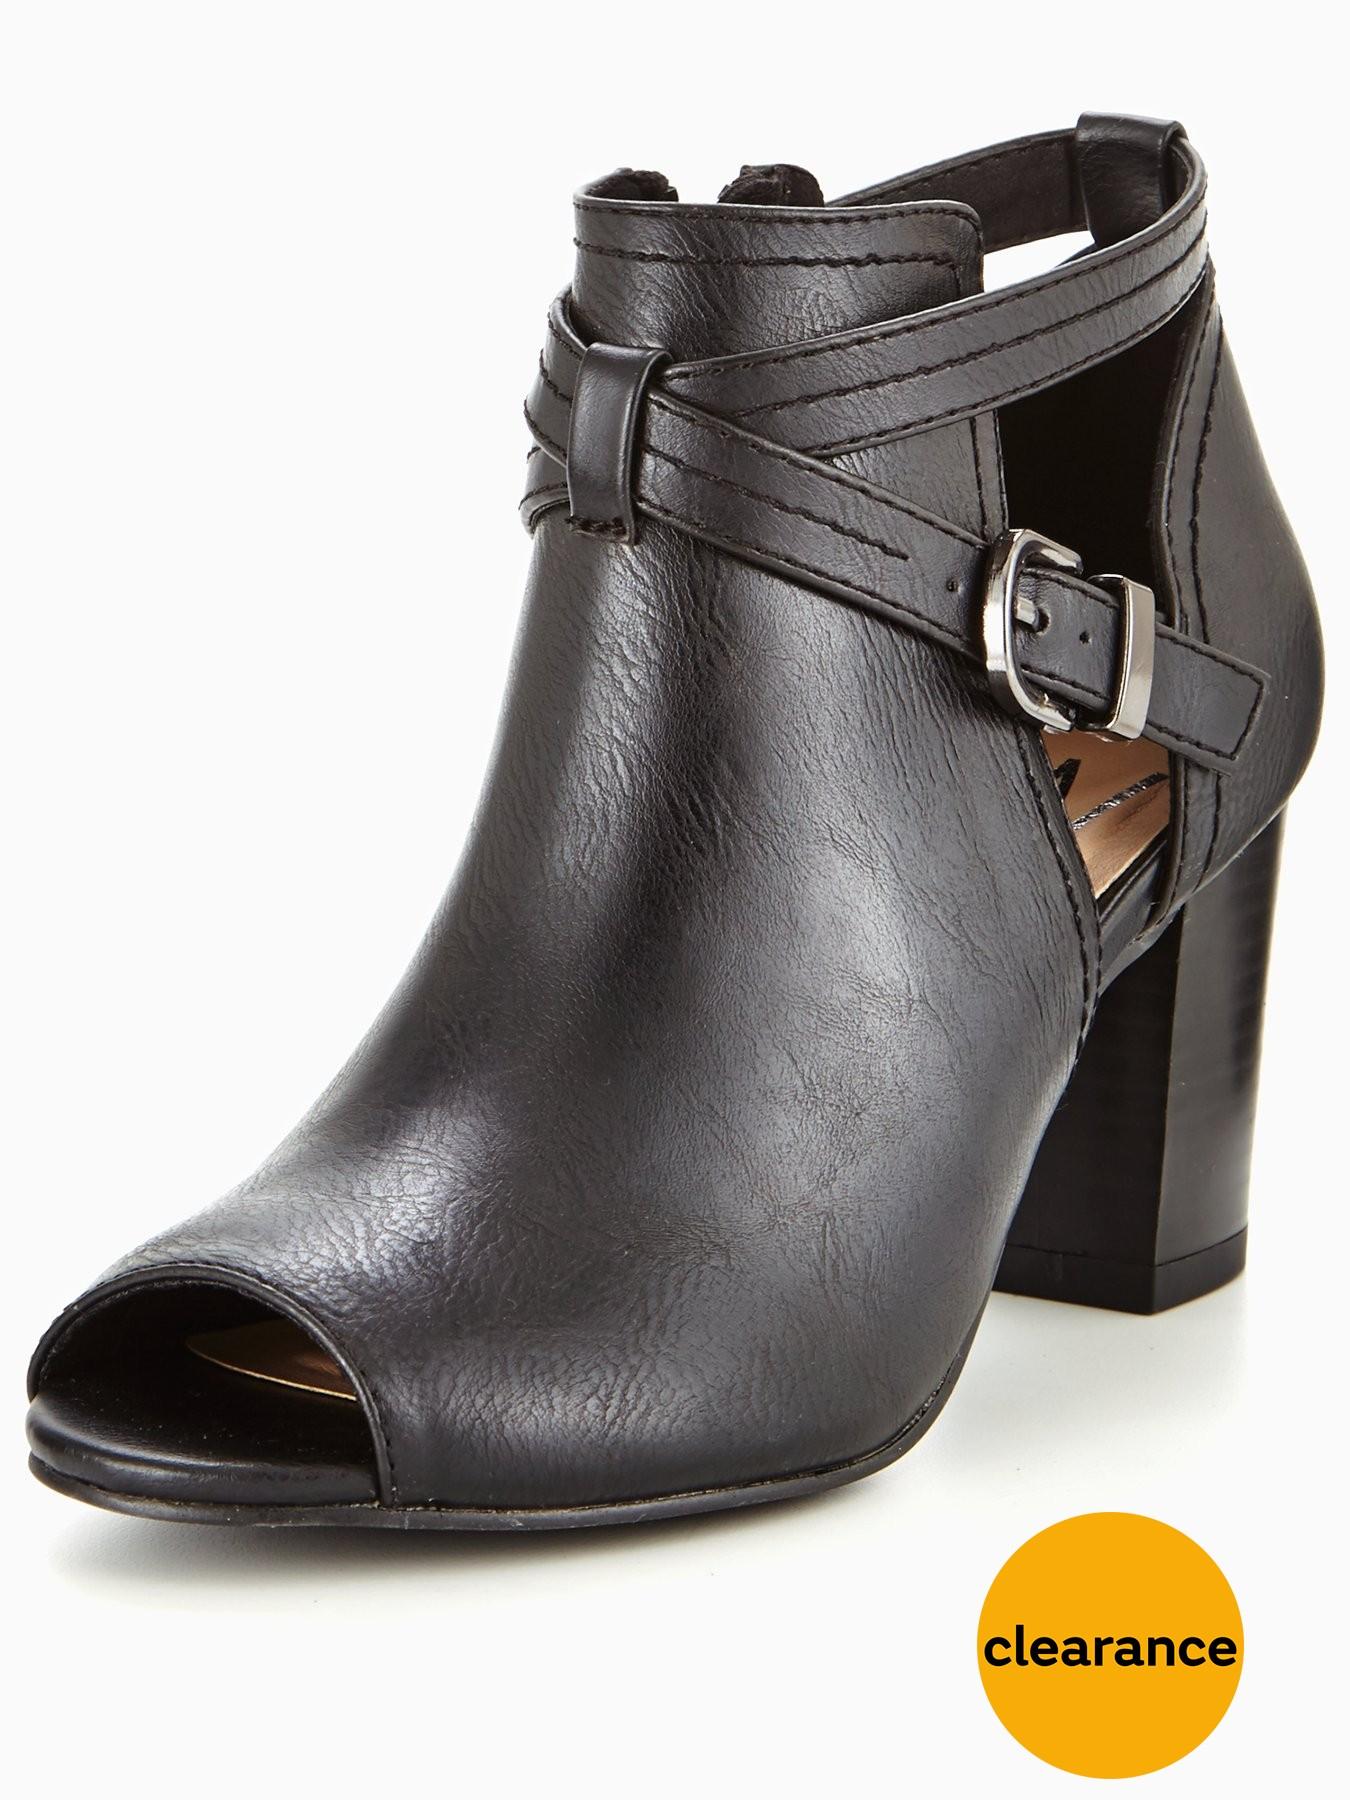 Wallis Abree Peep Toe Ankle Boot Black 1600184713 Women's Shoes Wallis Boots